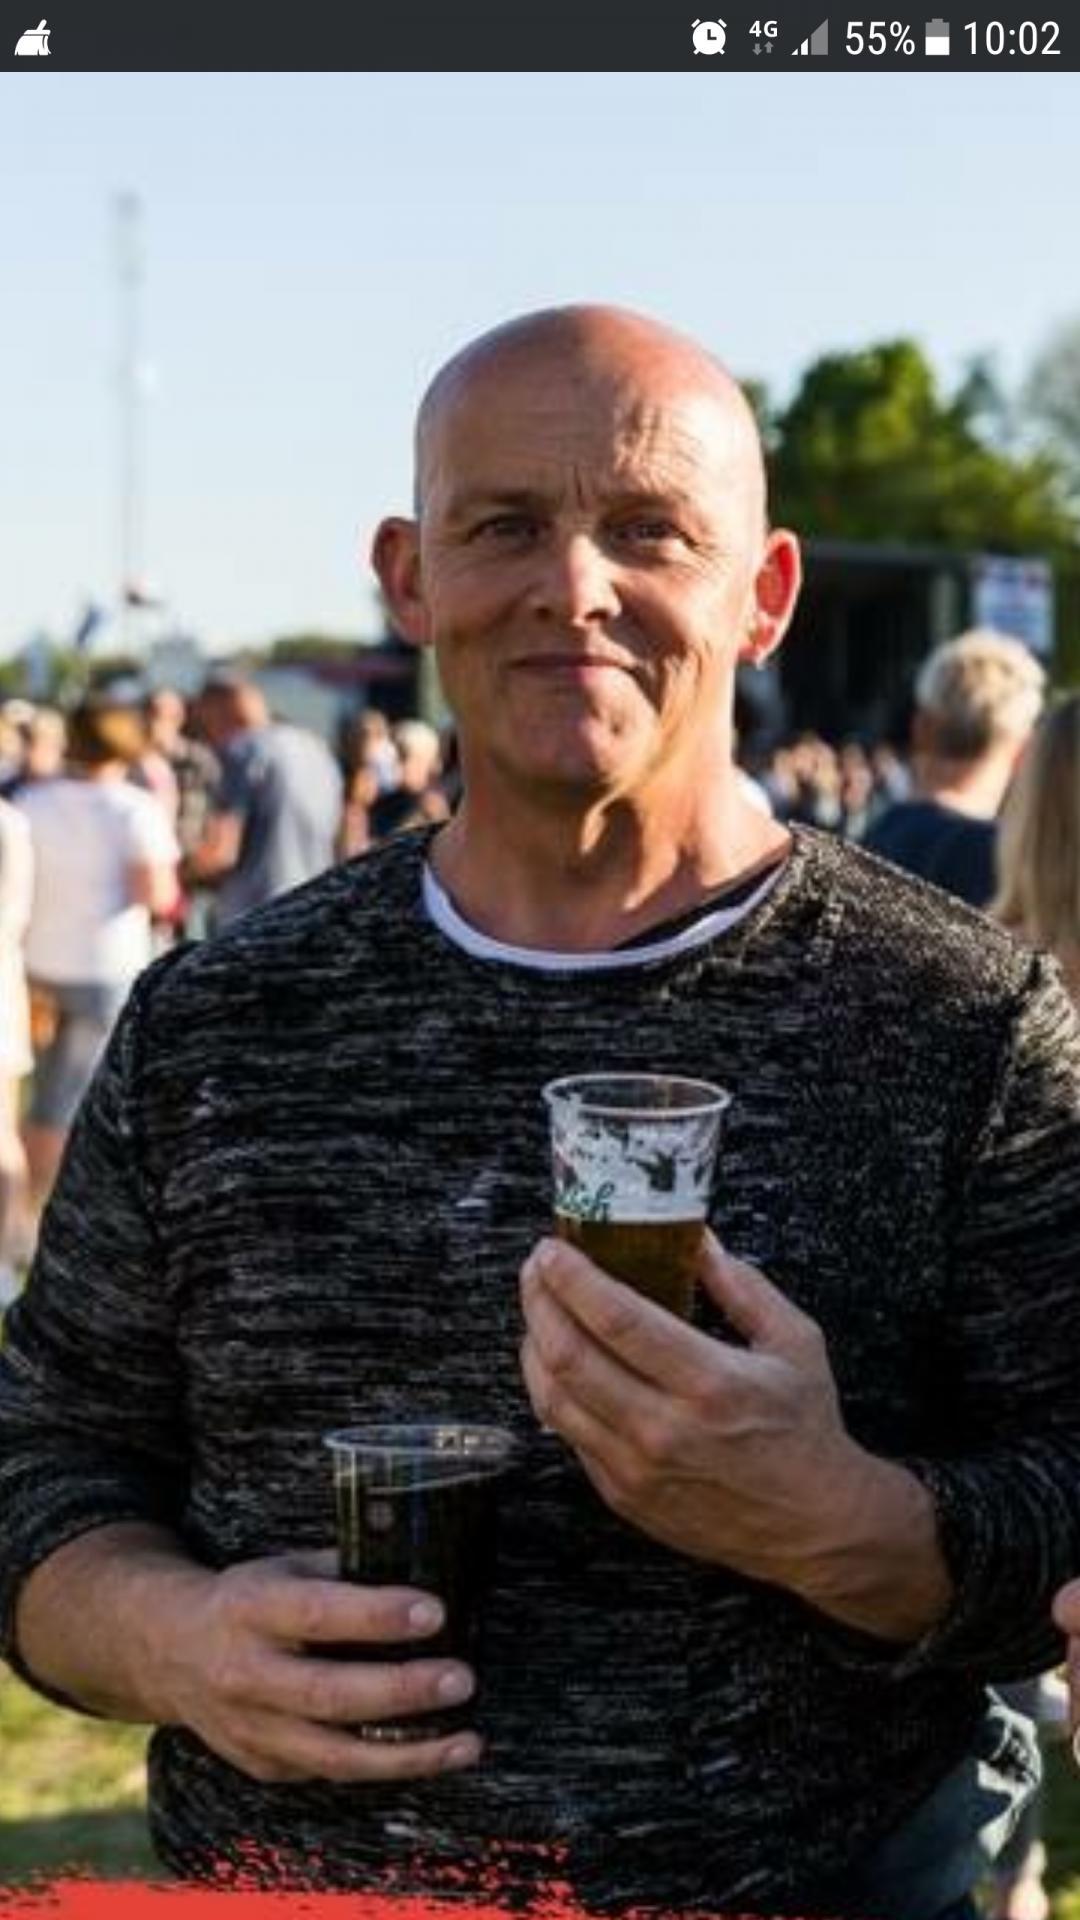 Beer53 uit Drenthe,Nederland